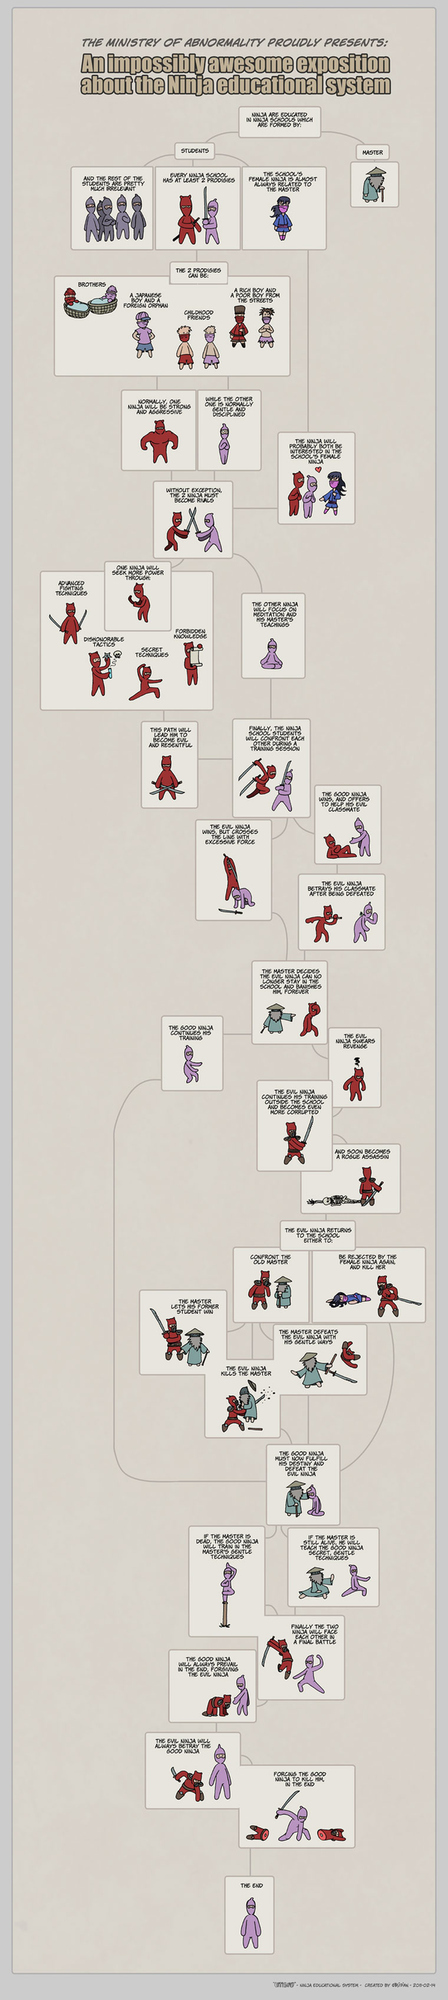 An Exposé Of The Ninja Educational System